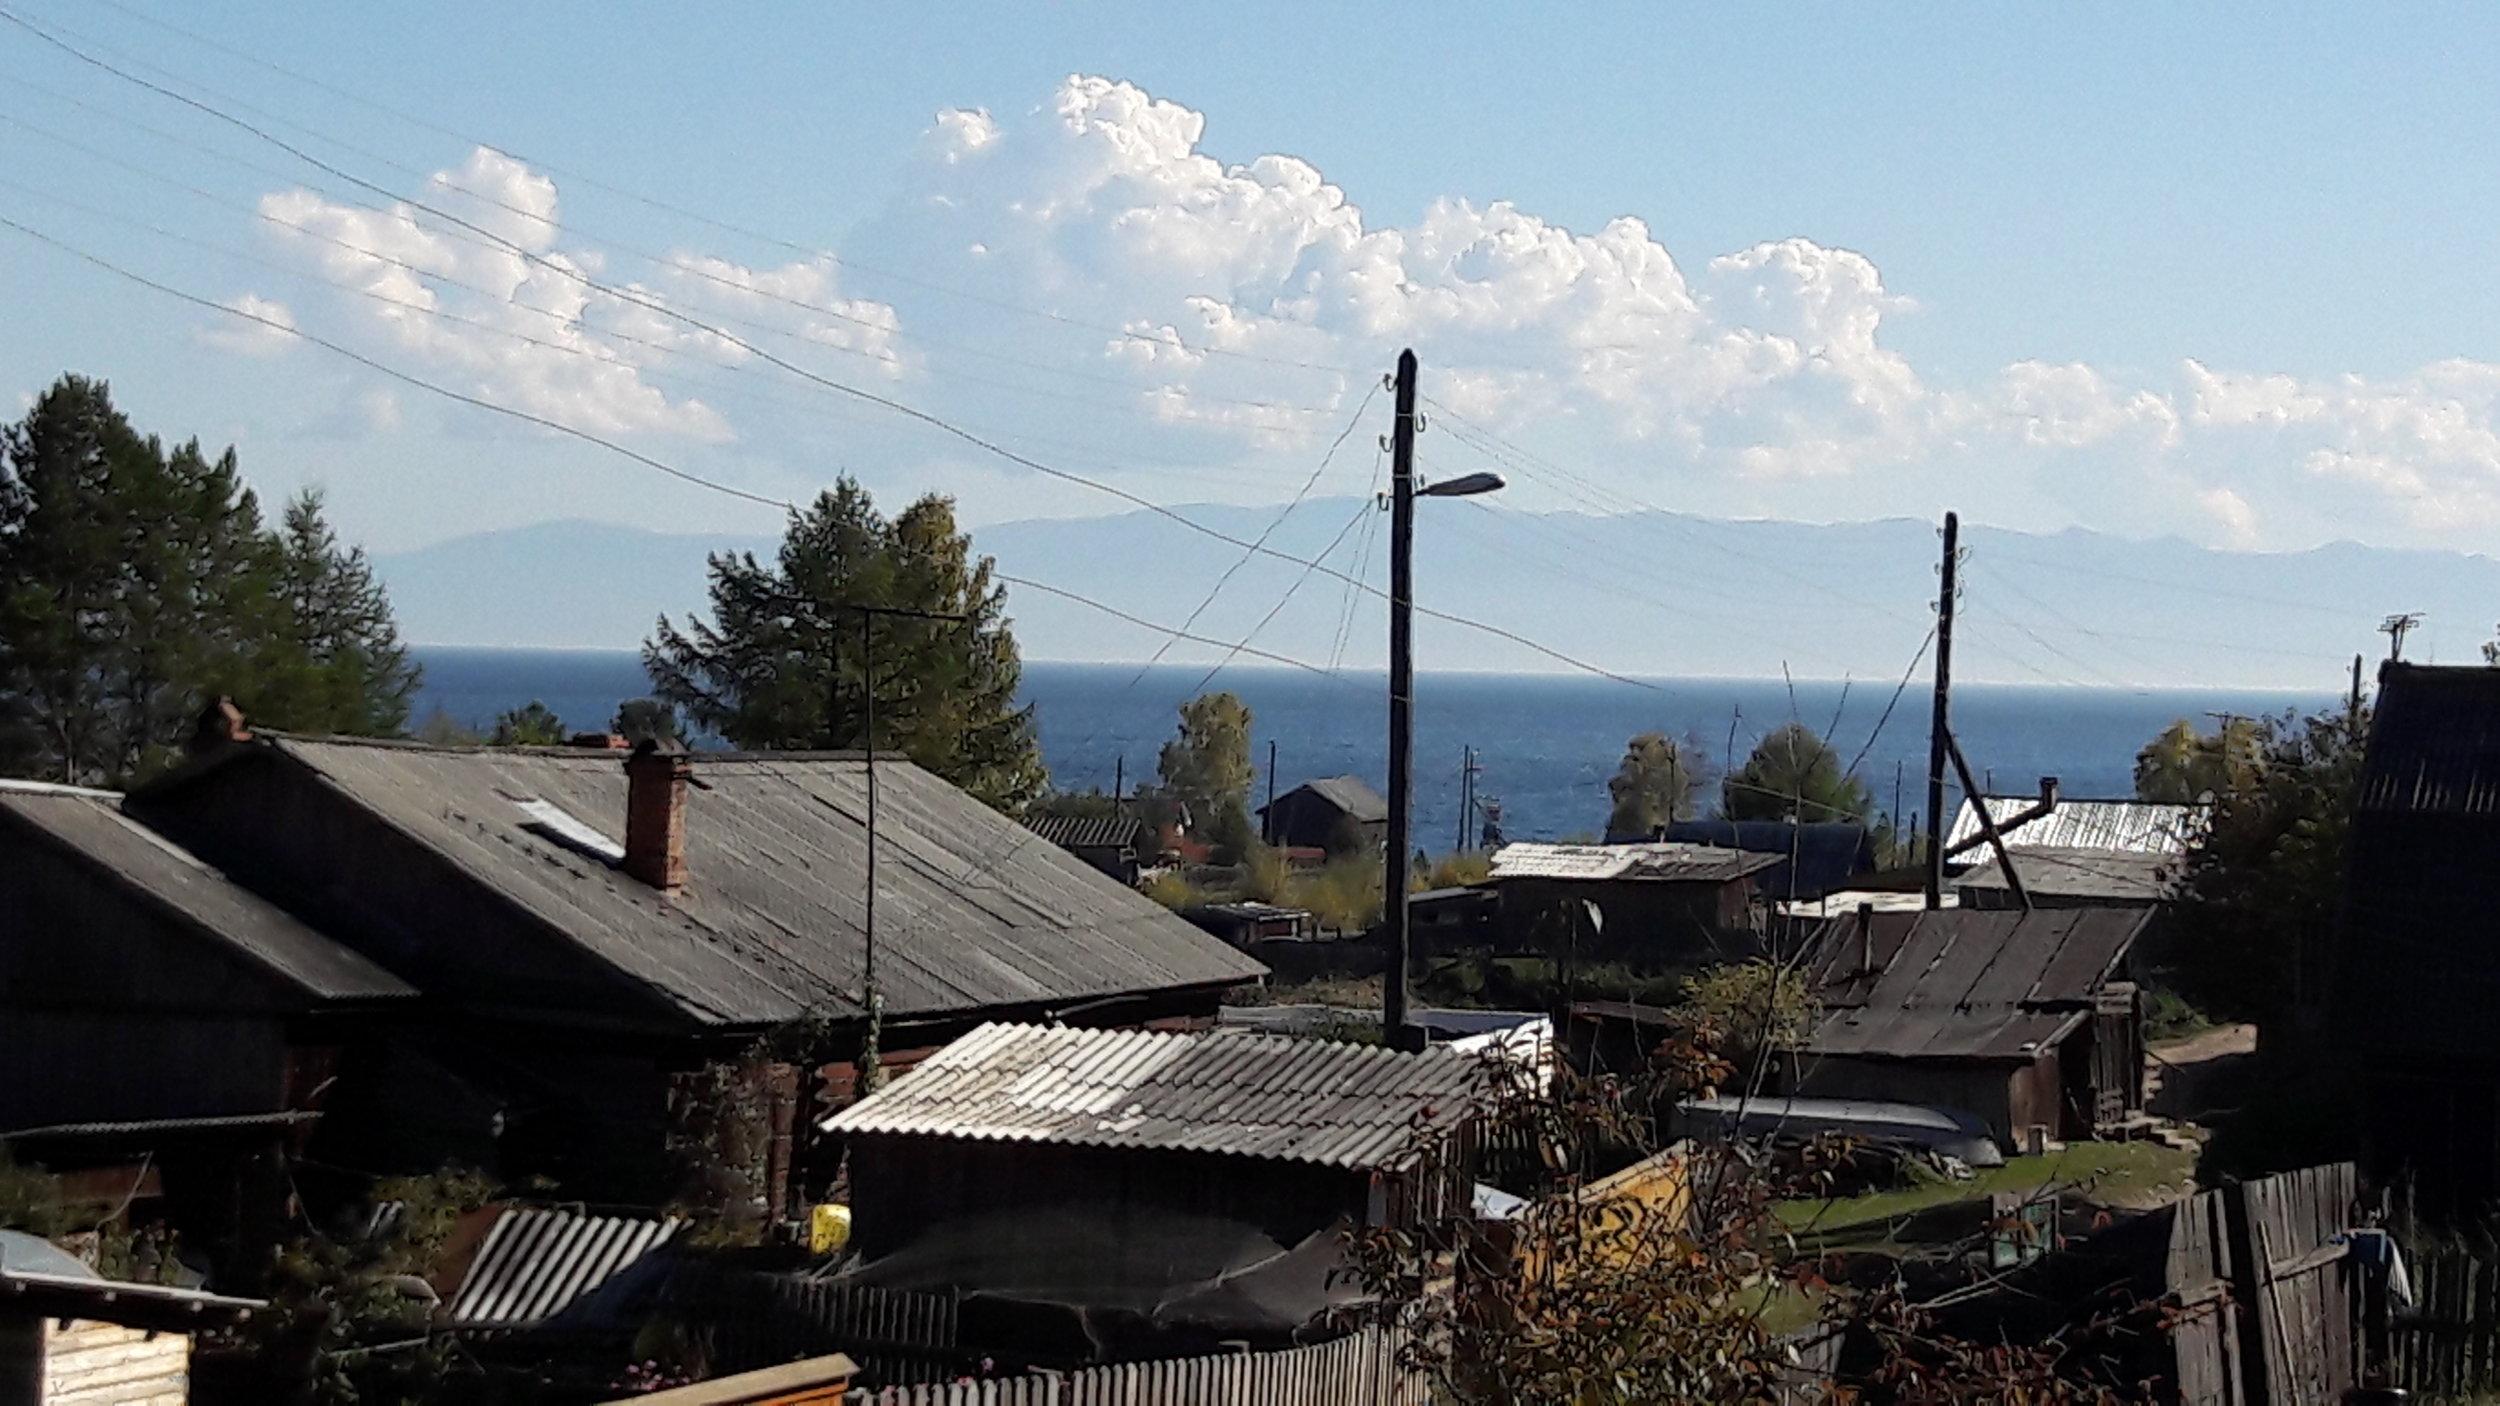 Fotos_WEbsite_Baikalsee (4).jpg